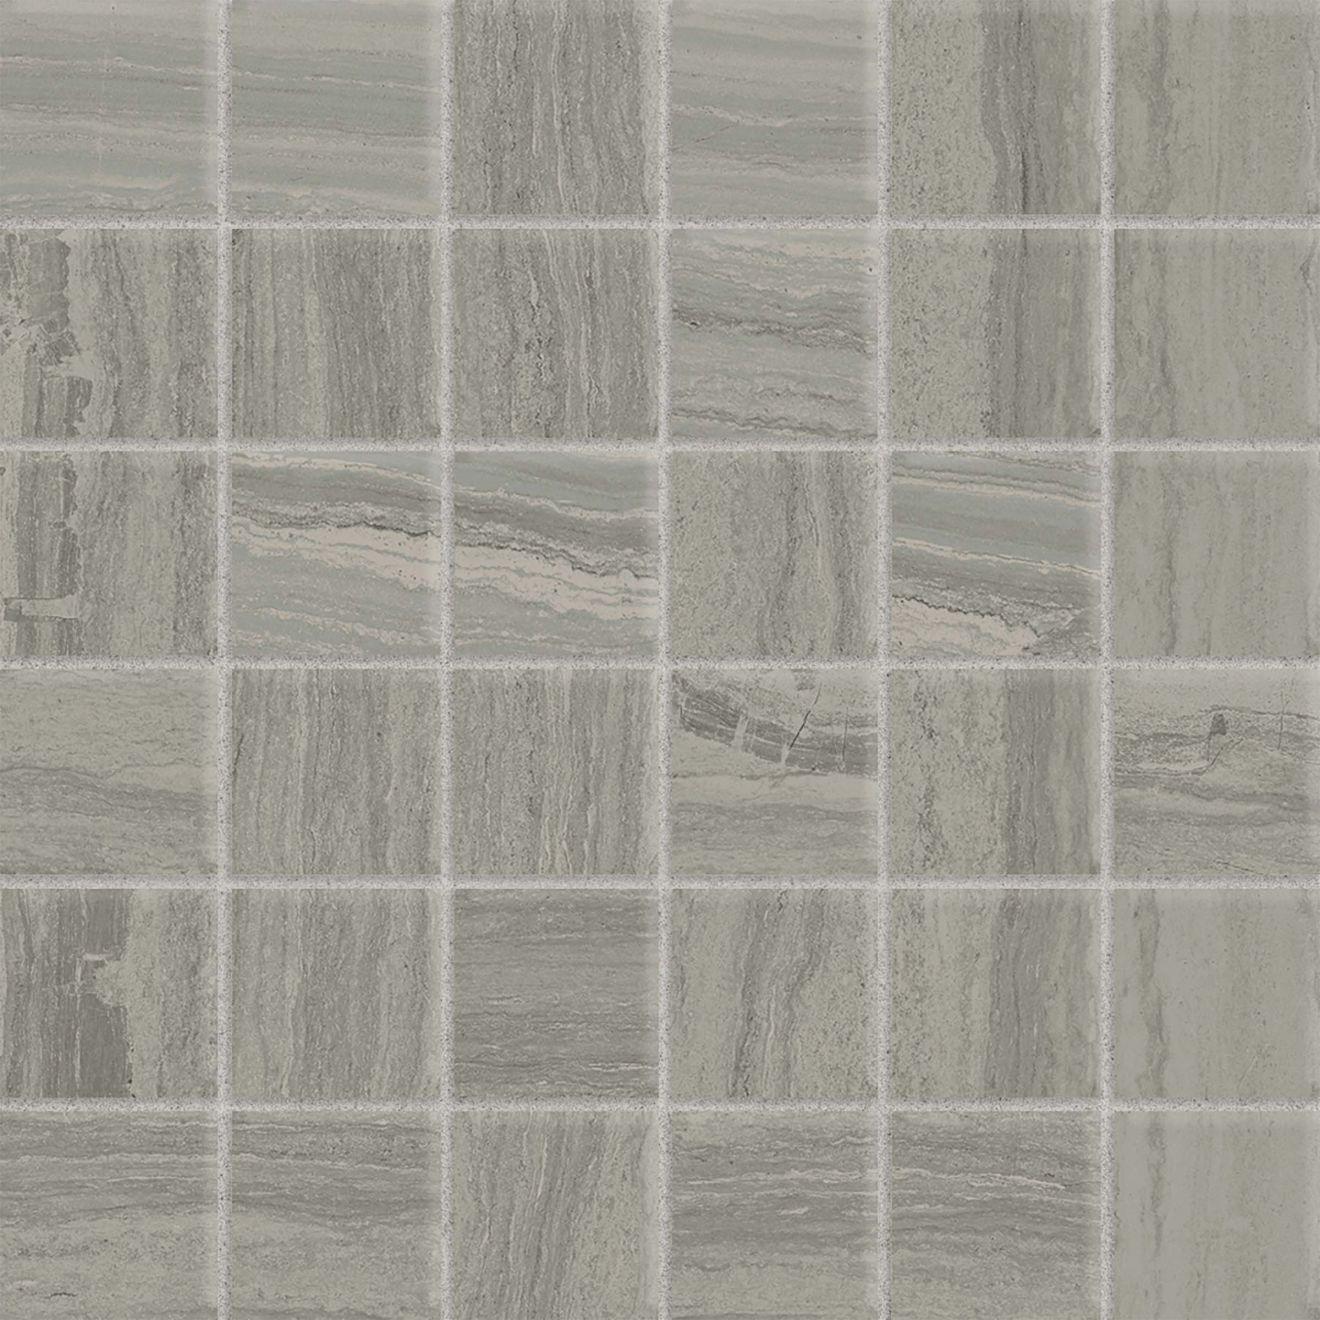 "Highland 2"" x 2"" Floor & Wall Mosaic in Greige"